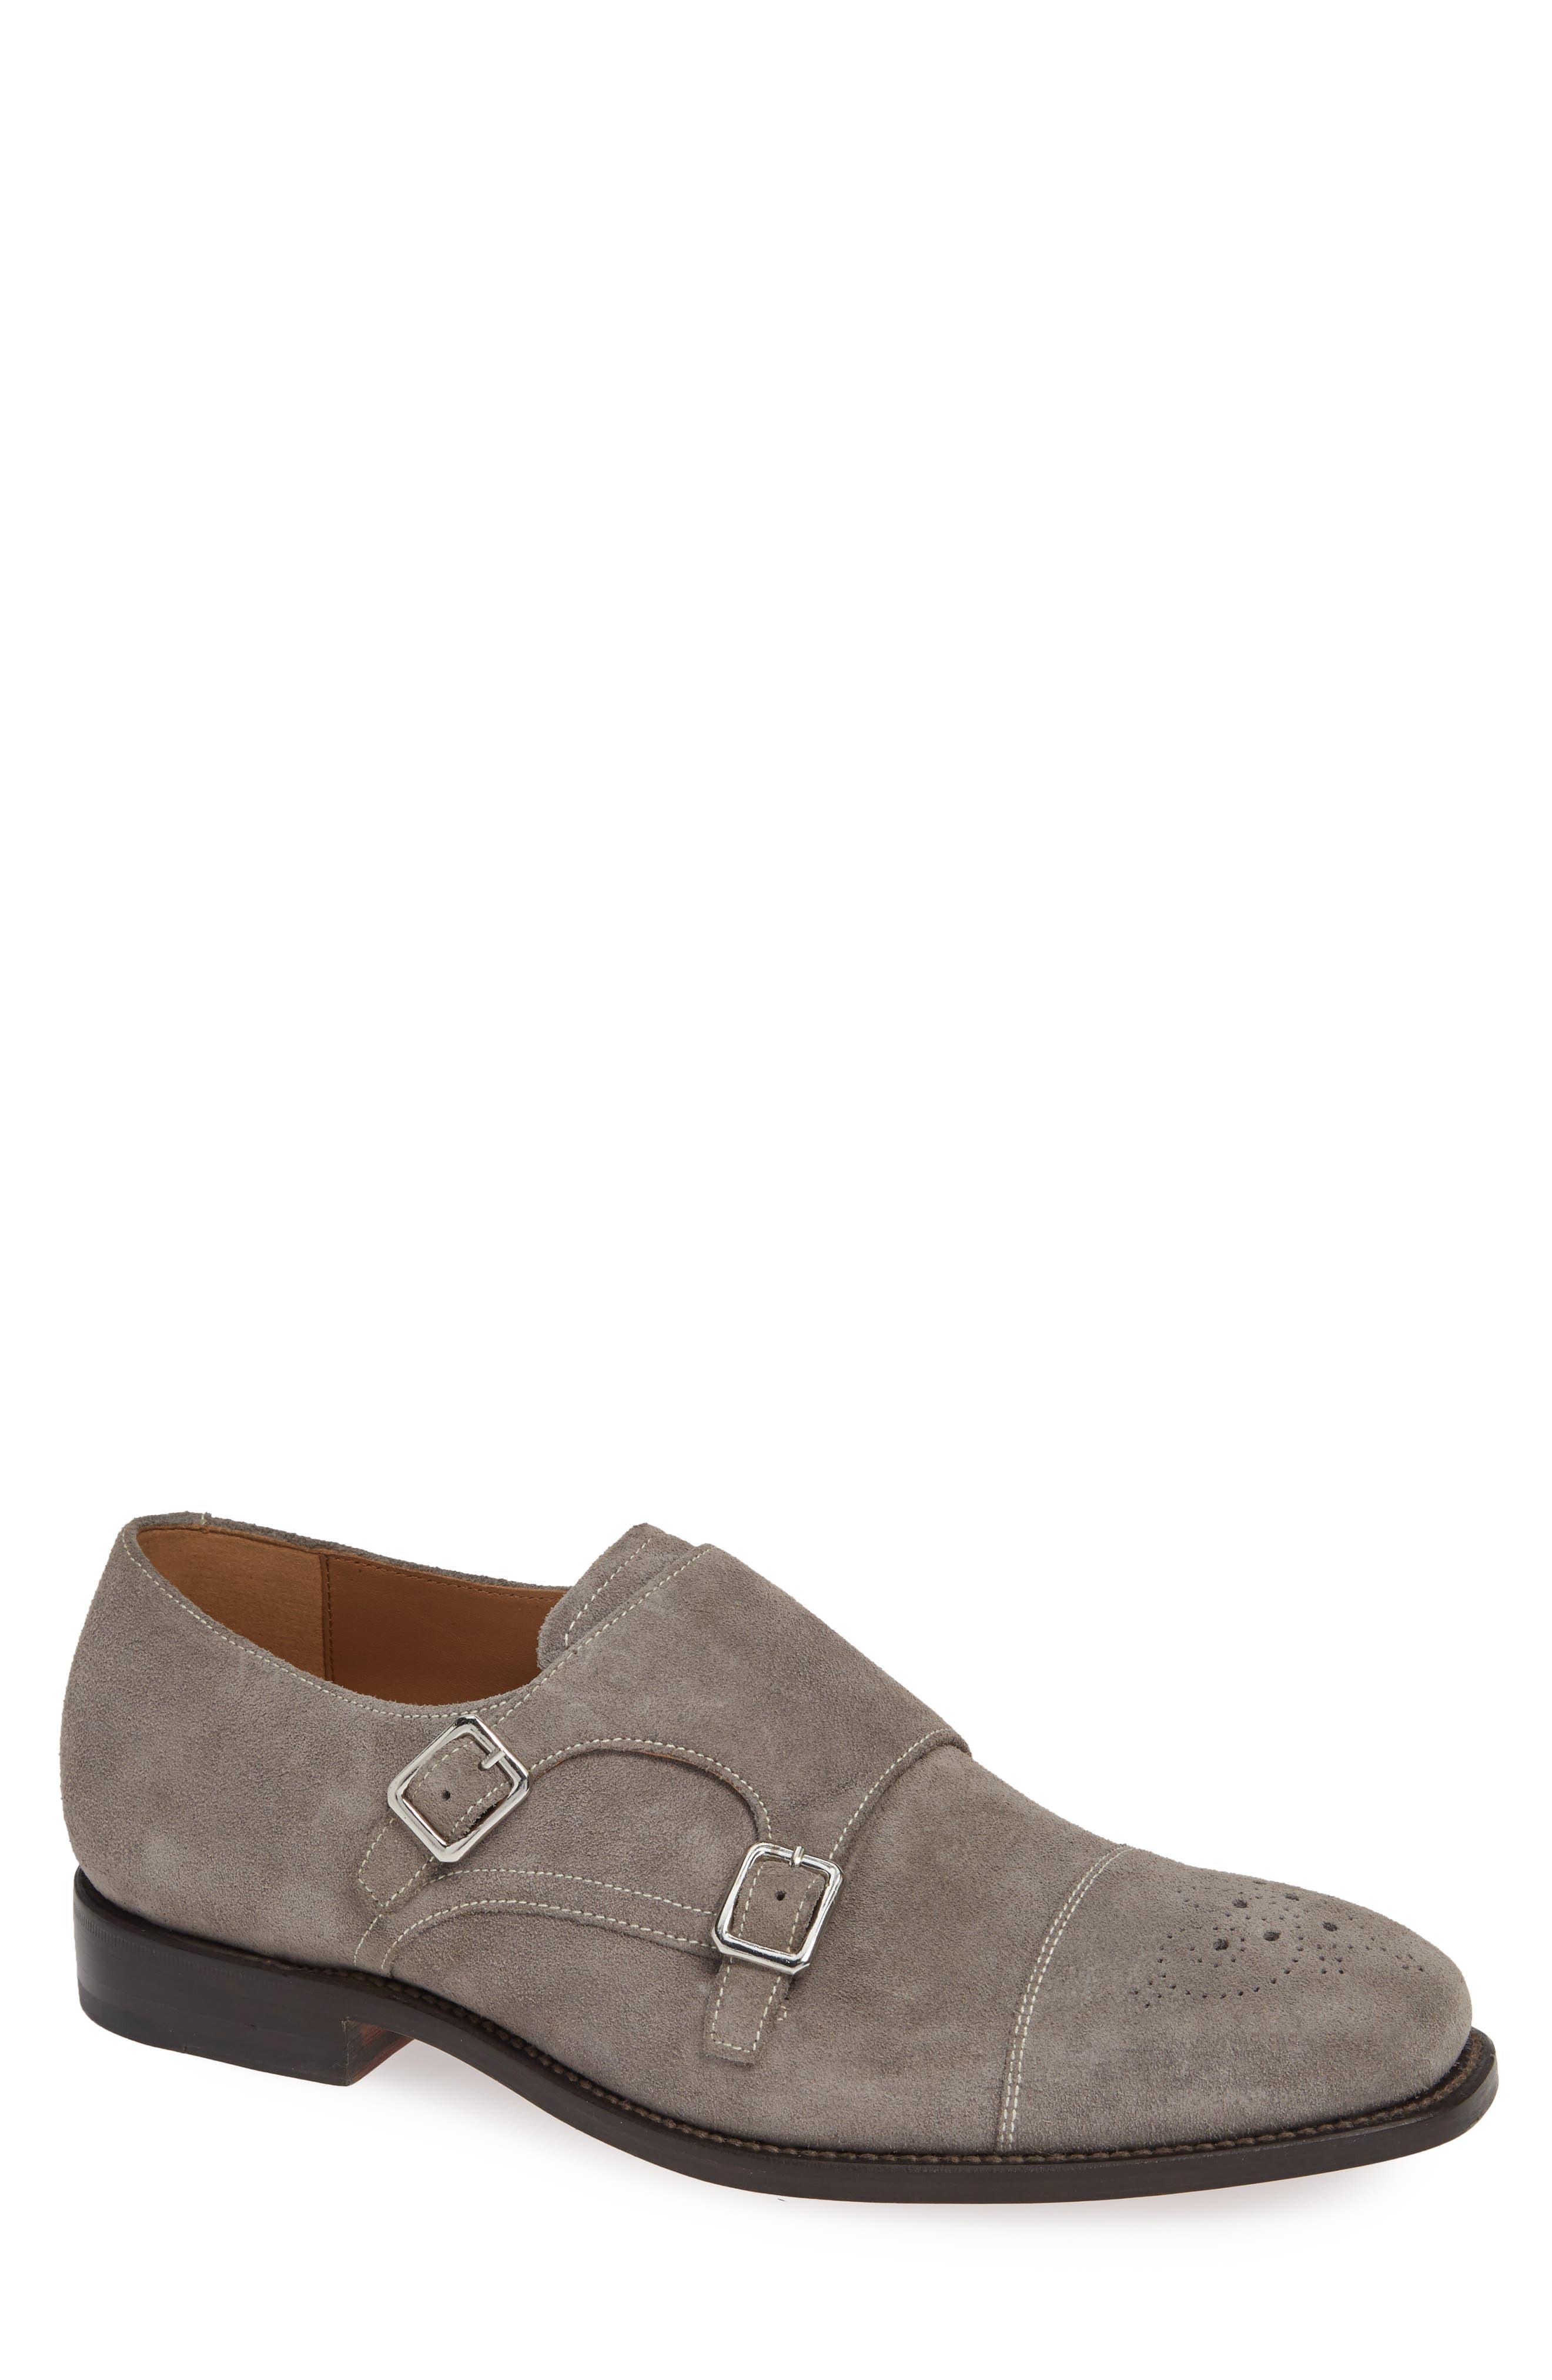 Sausalito Double Monk Strap Shoe,                             Main thumbnail 1, color,                             GREY SUEDE